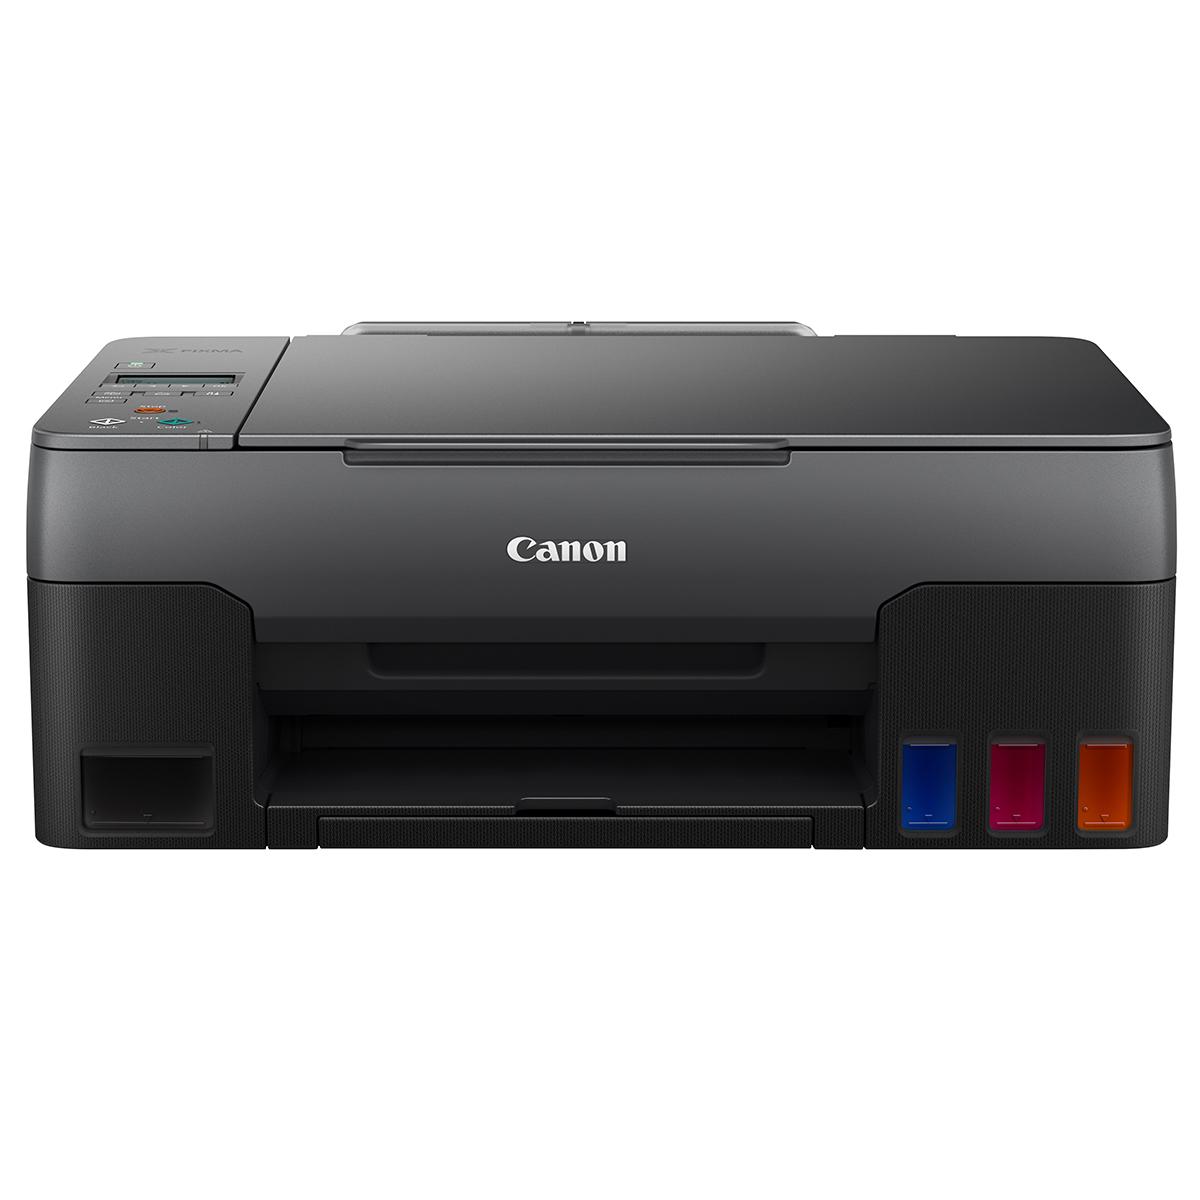 Canon Pixma G2520 A4 Inkjet Multifunction